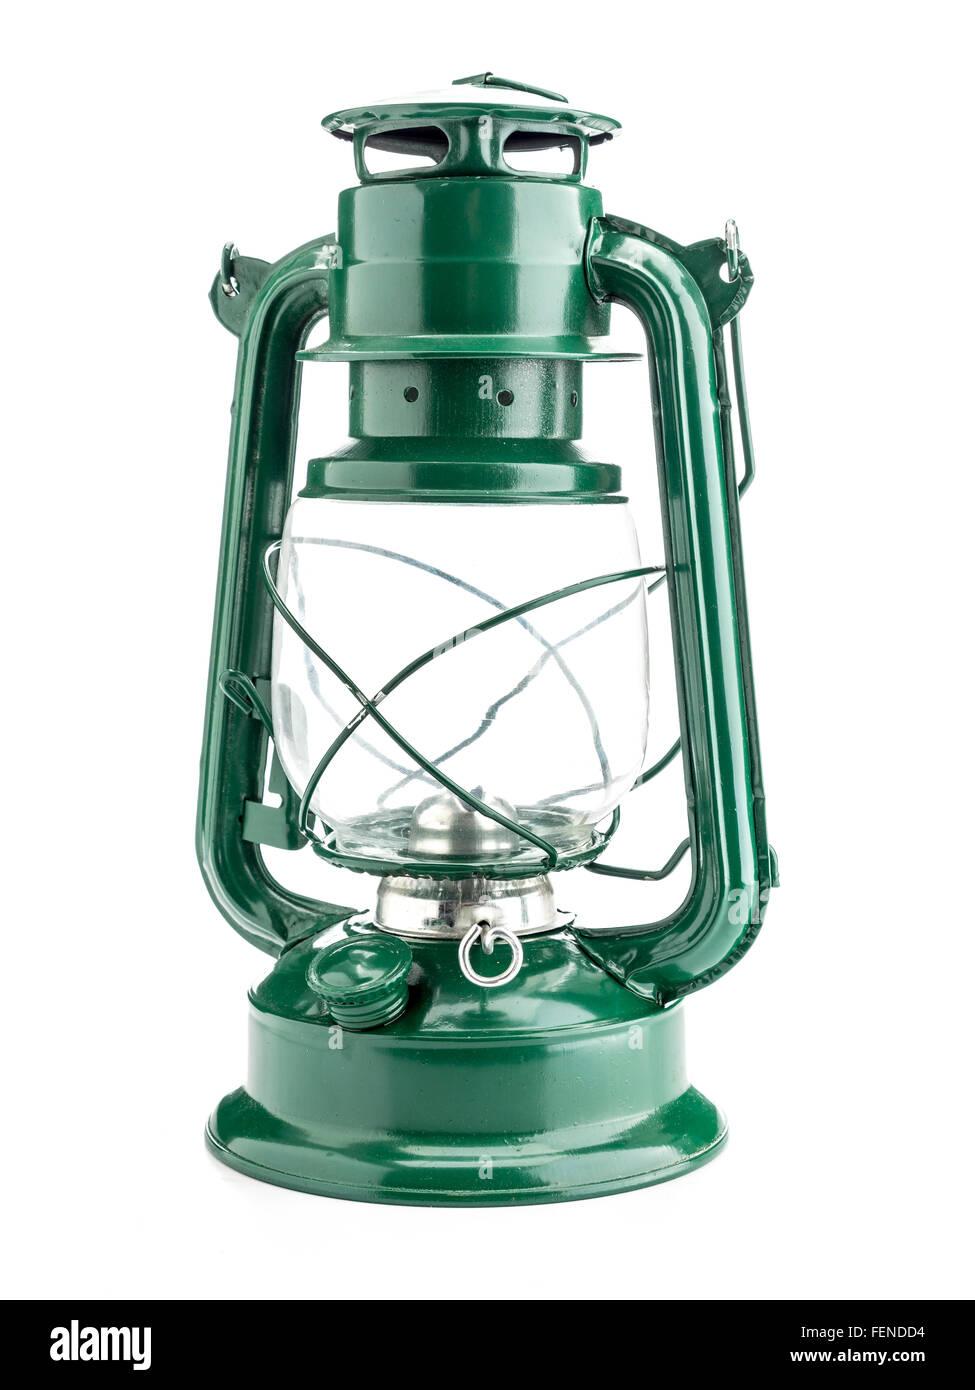 Vintage green oil lamp on white background - Stock Image